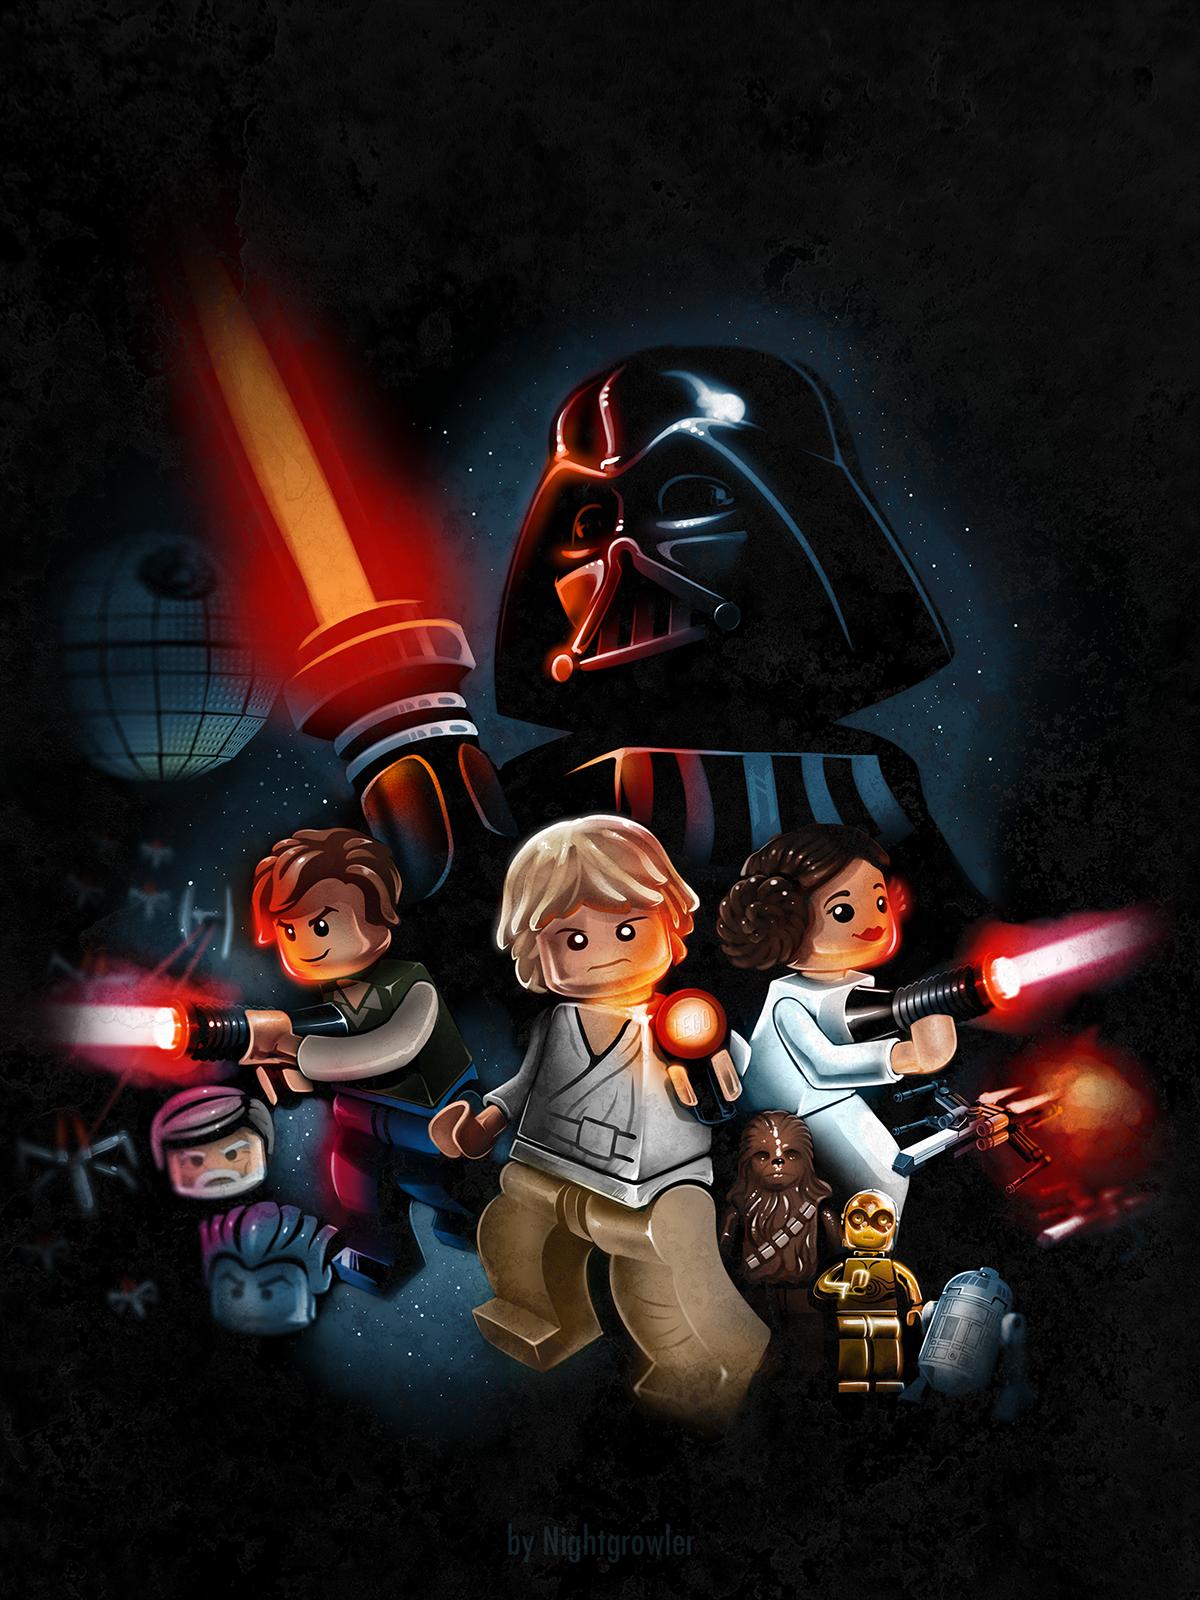 Lego Star Wars Art By Night Growler Festa Star Wars Star Wars